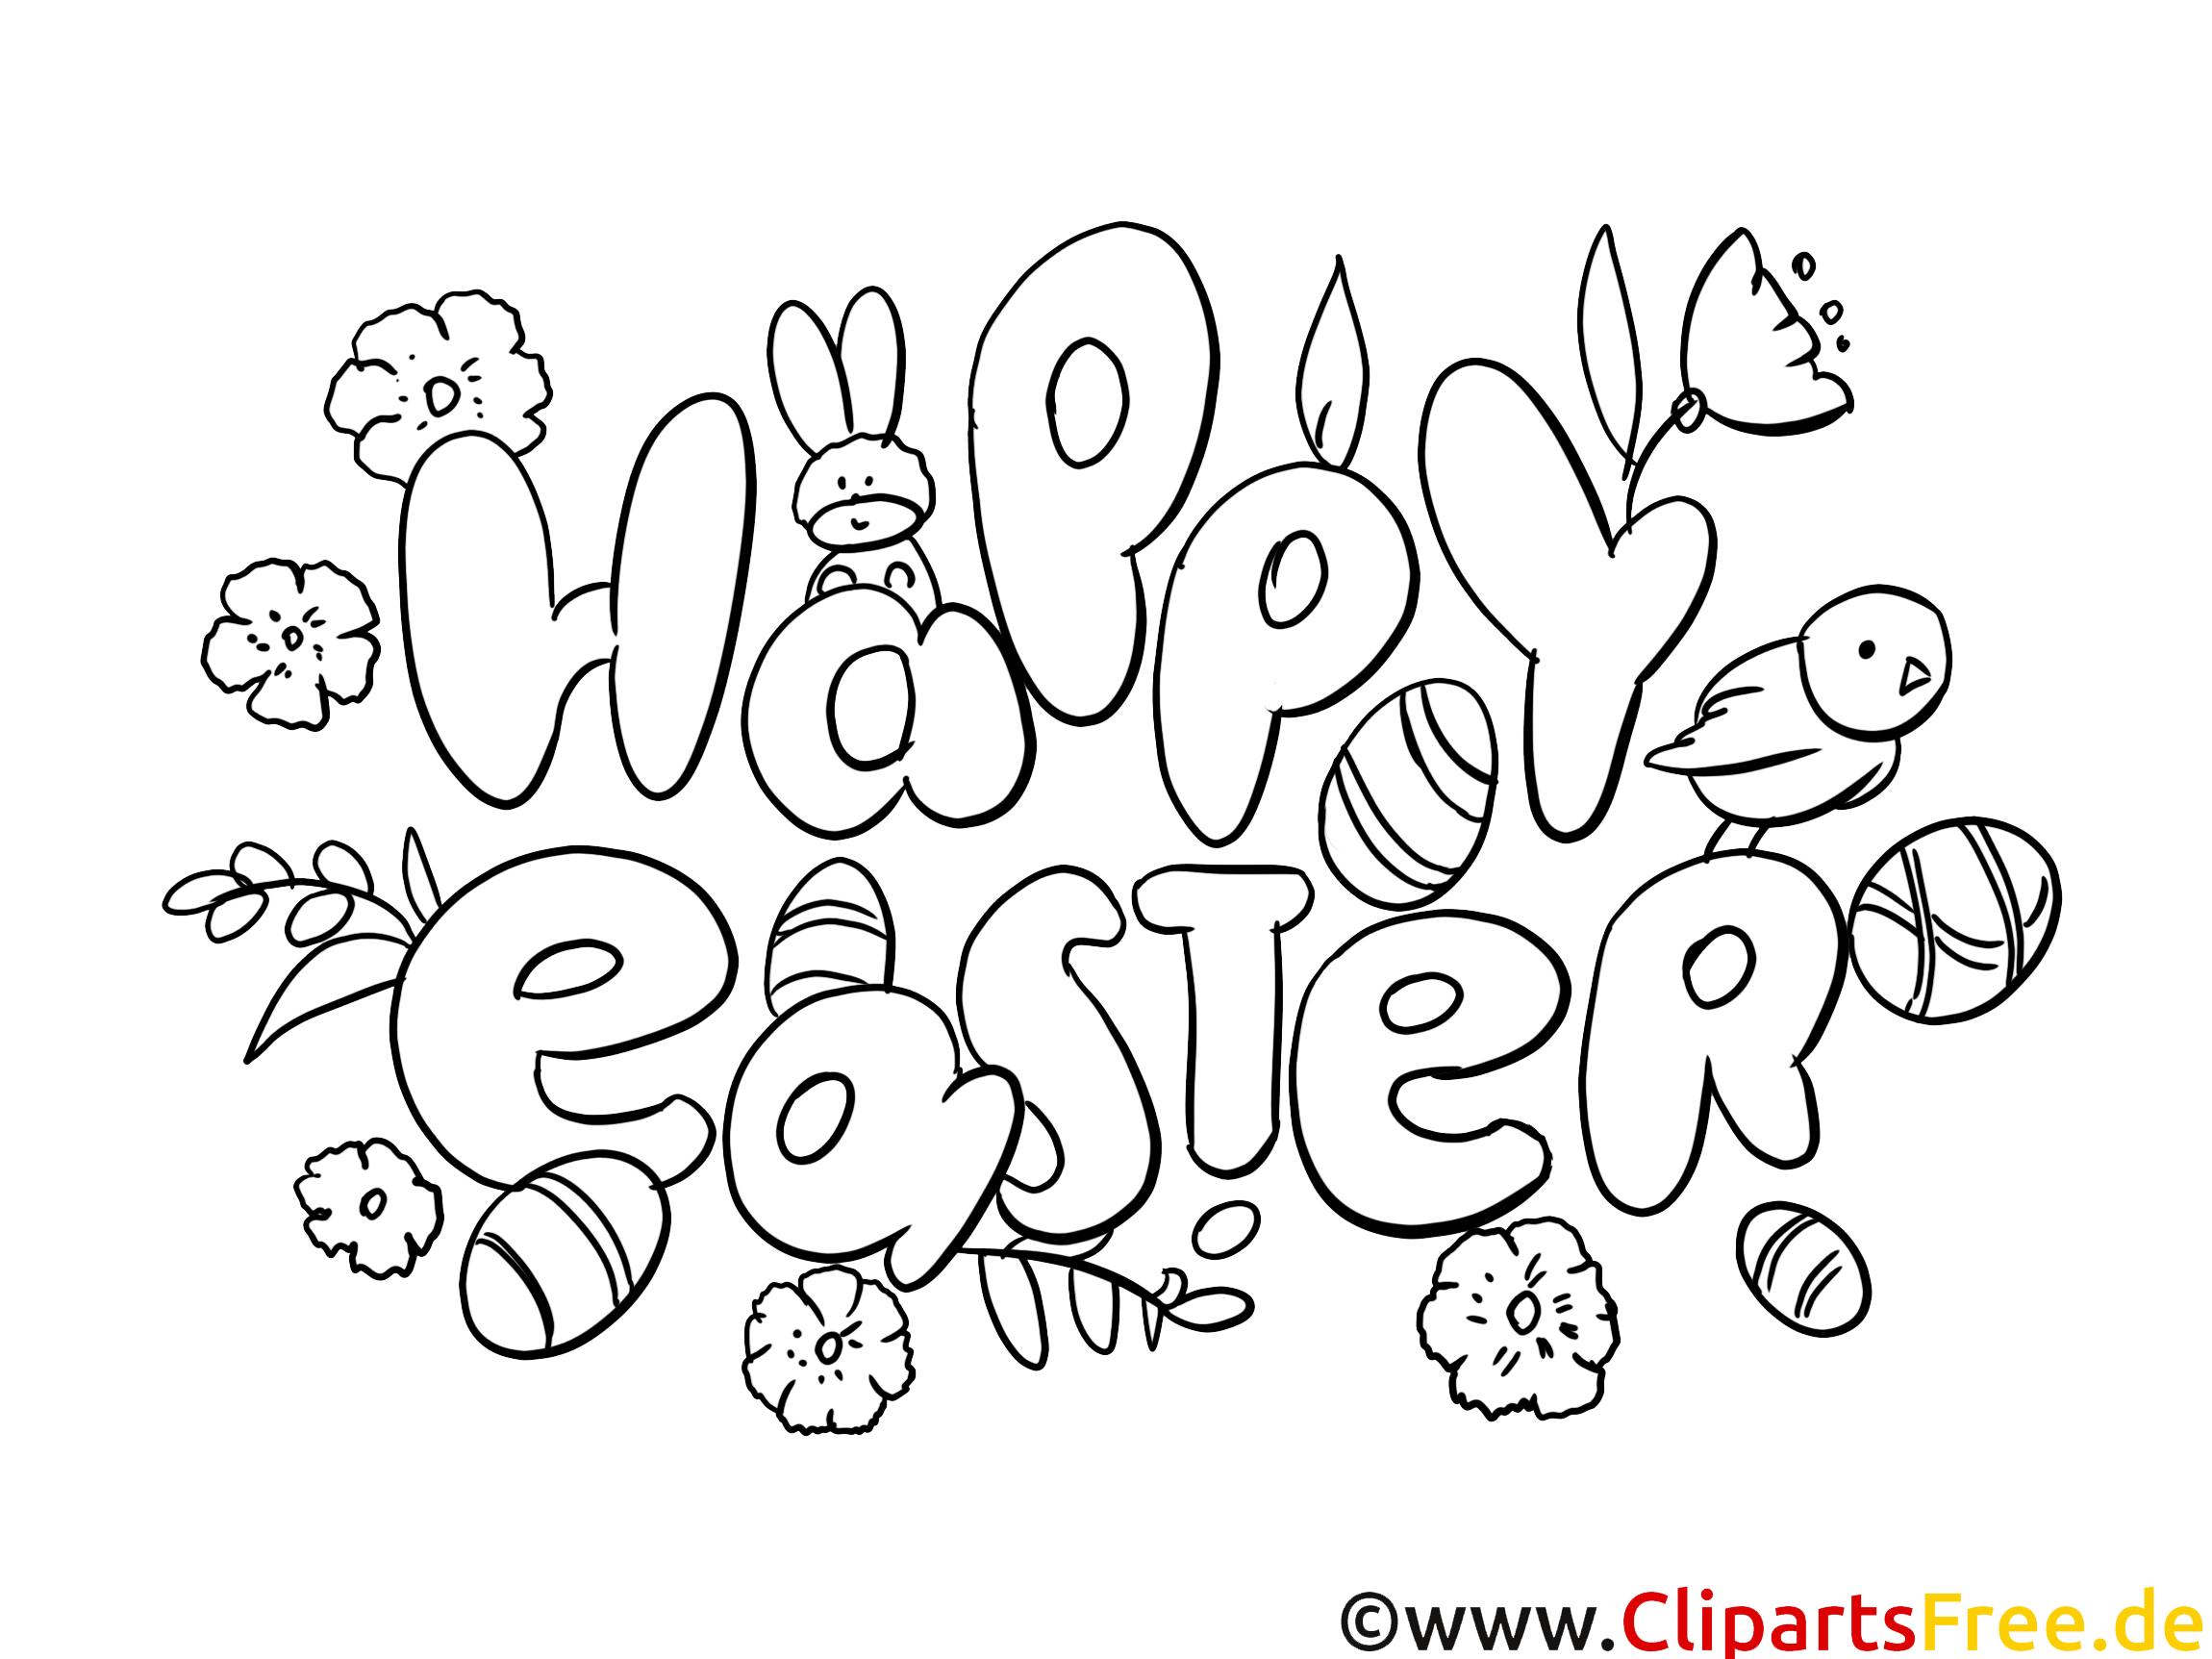 Happy Eatser colouring page PDF